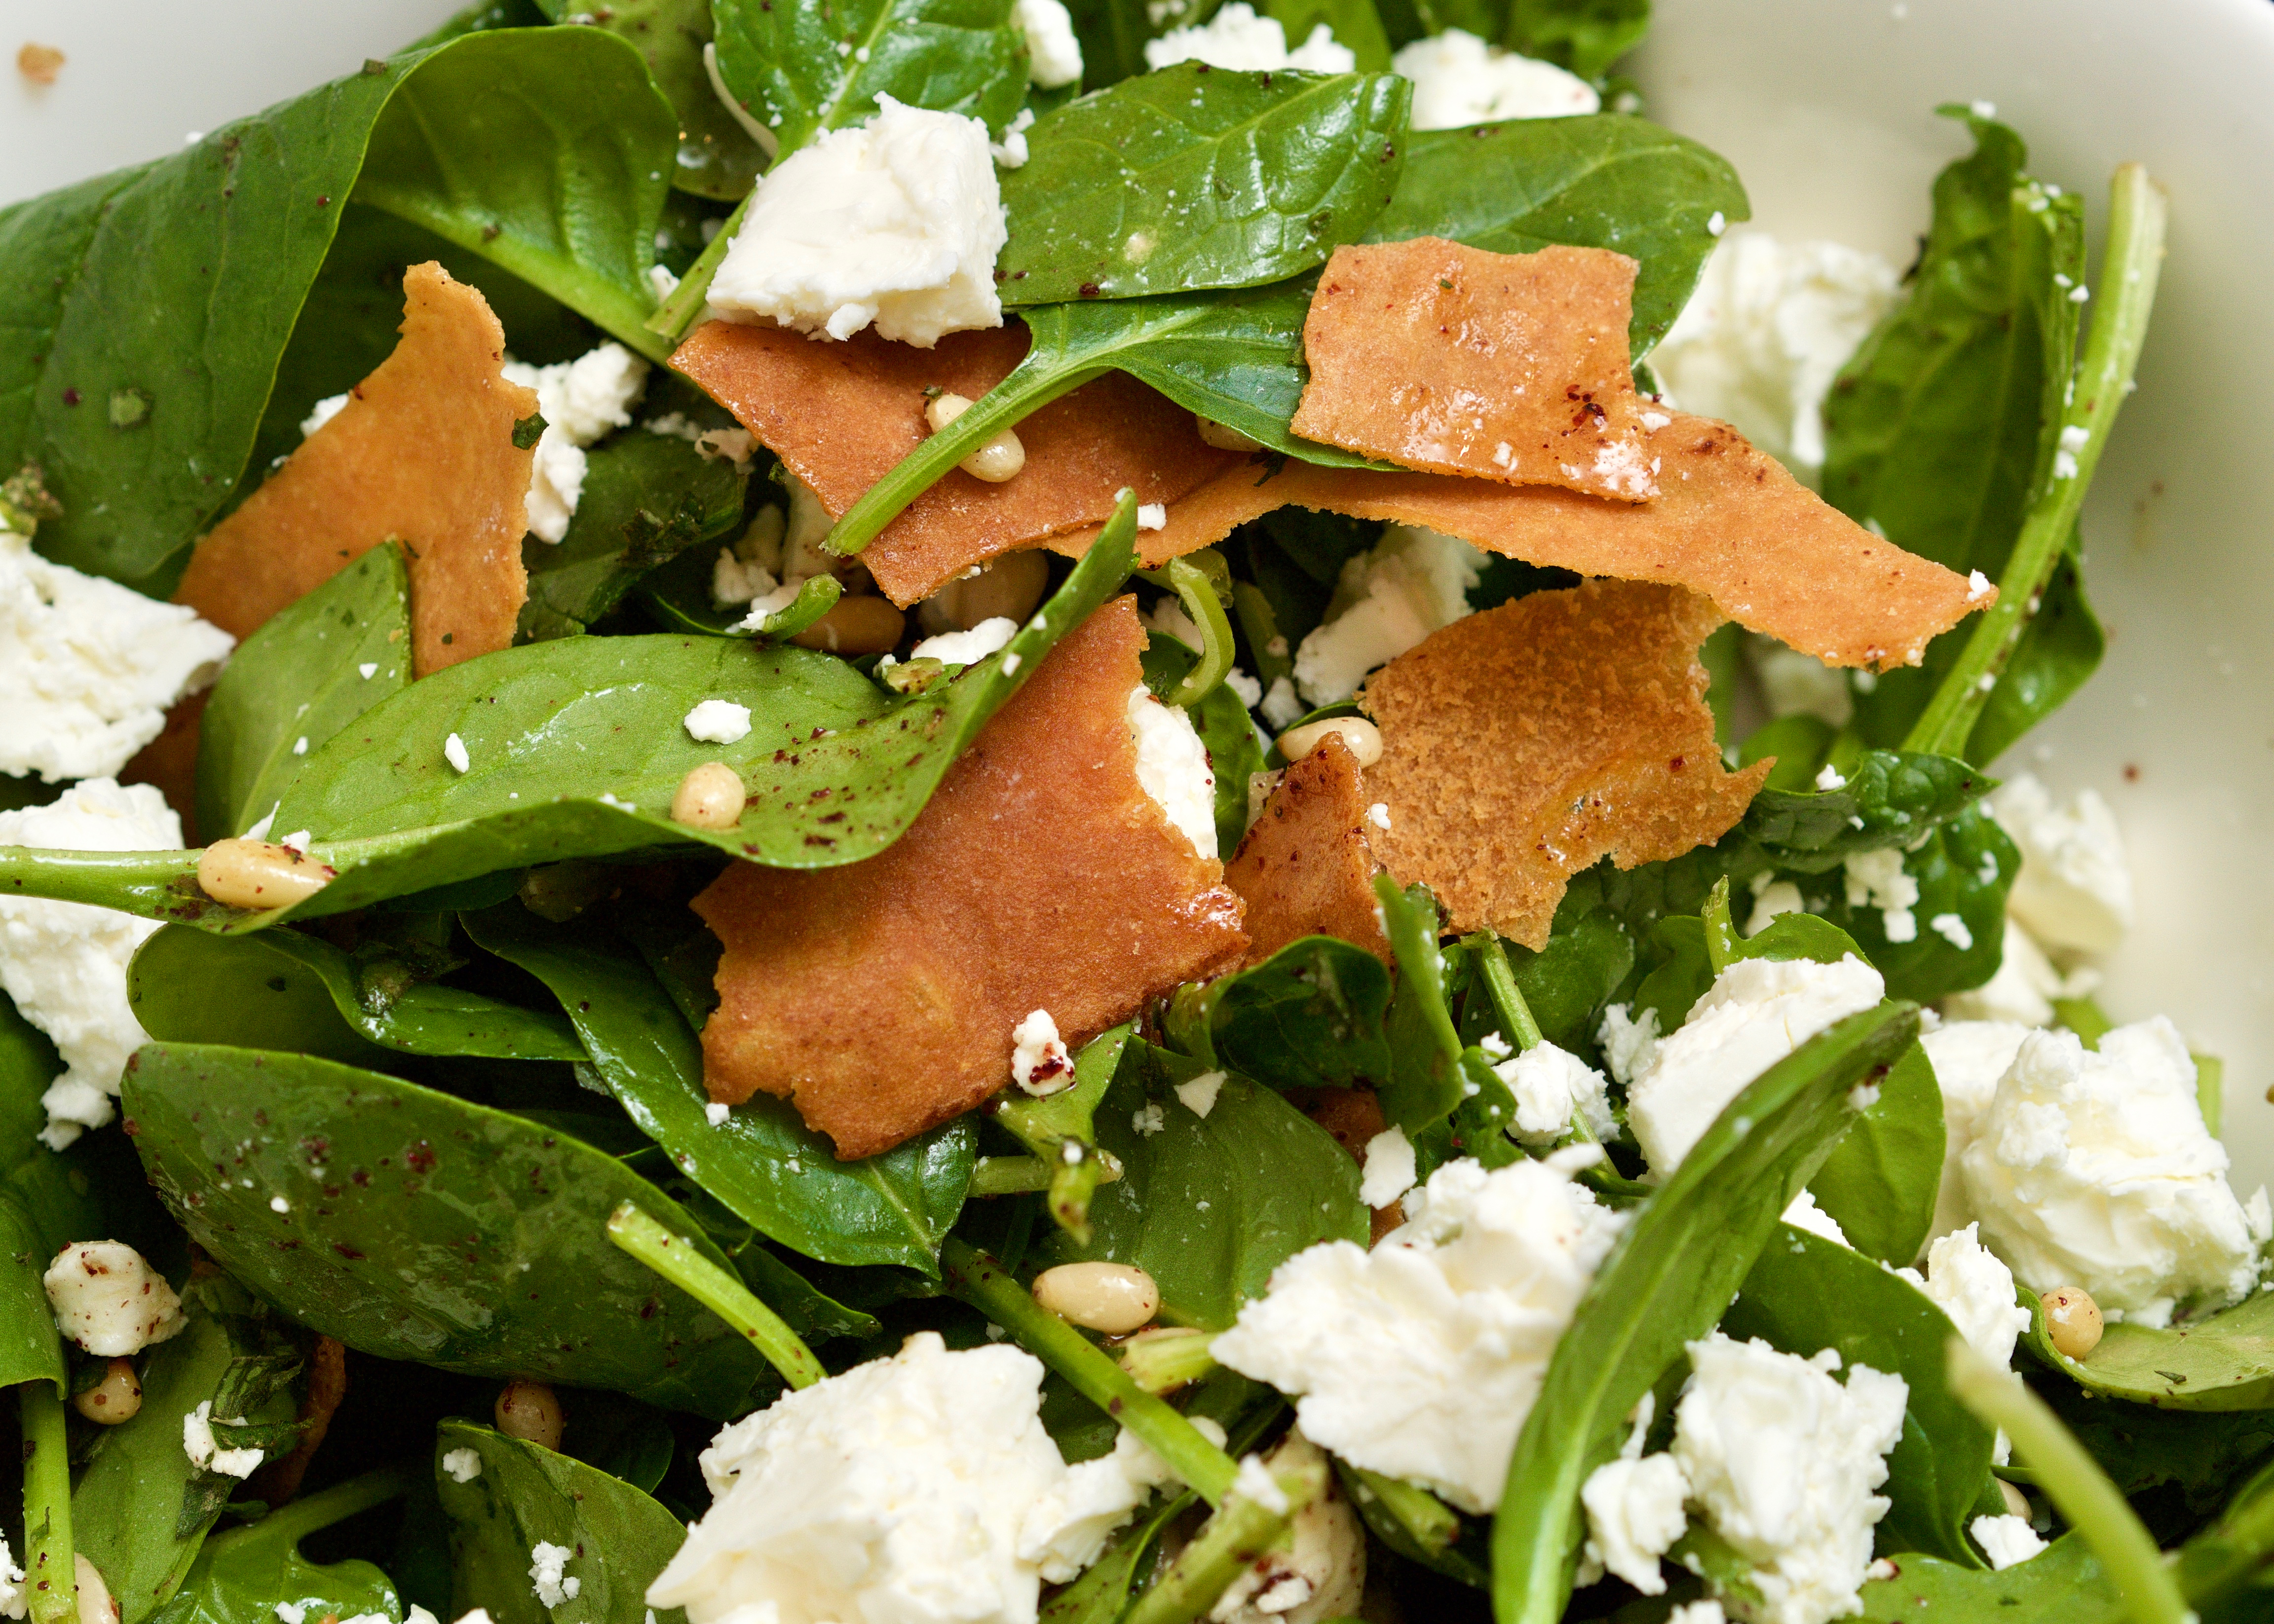 Feta salad with spinach, crispbread, sumac & pinenuts